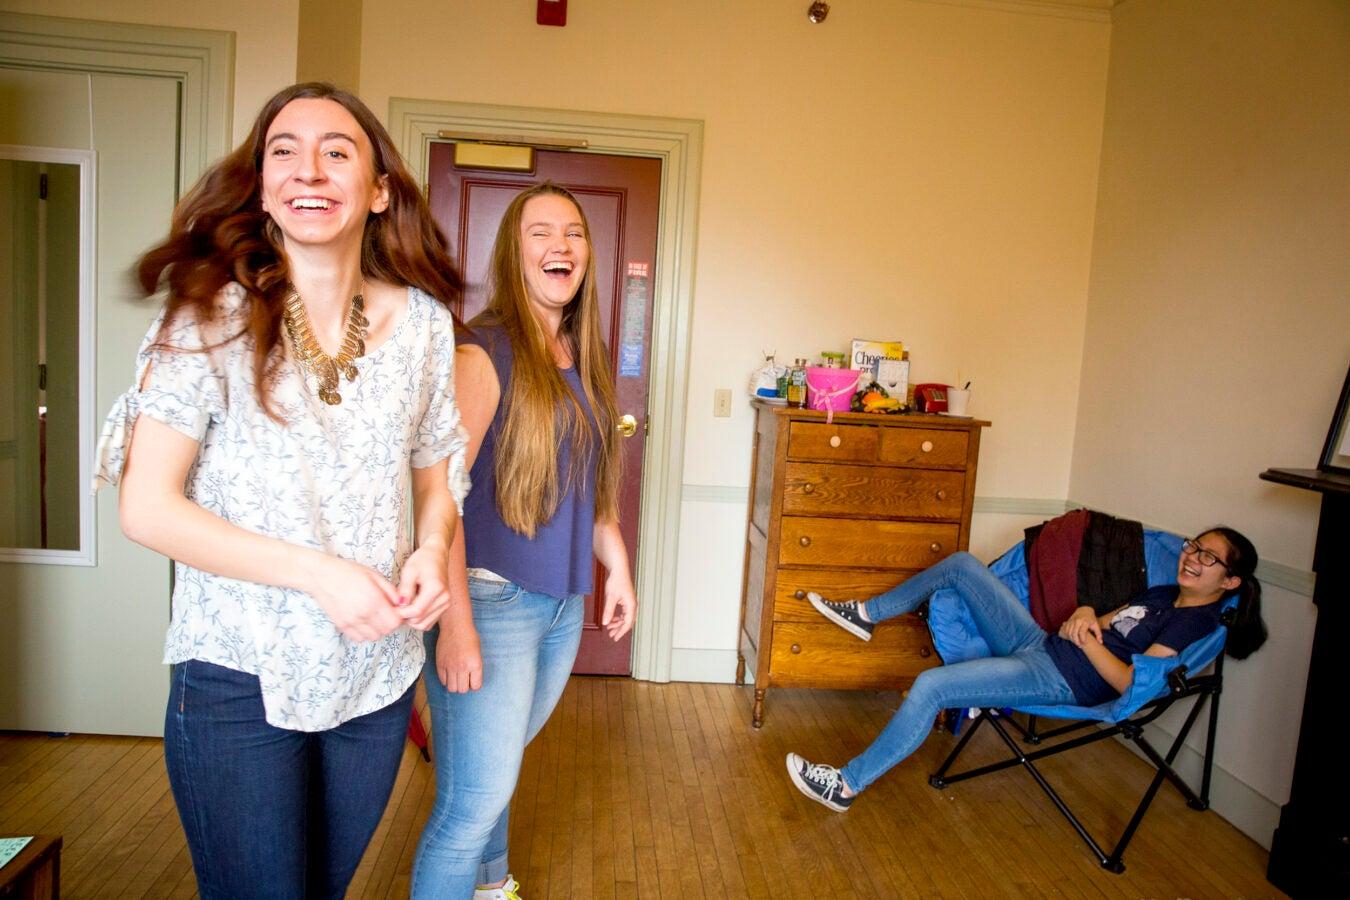 Thayer House freshmen friends, Kristie Colton, '20 of Utah (from left); Georgia Seidel, '20 of Australia, and Rebecca Chen, '20 of California are pictured in their dorm room.